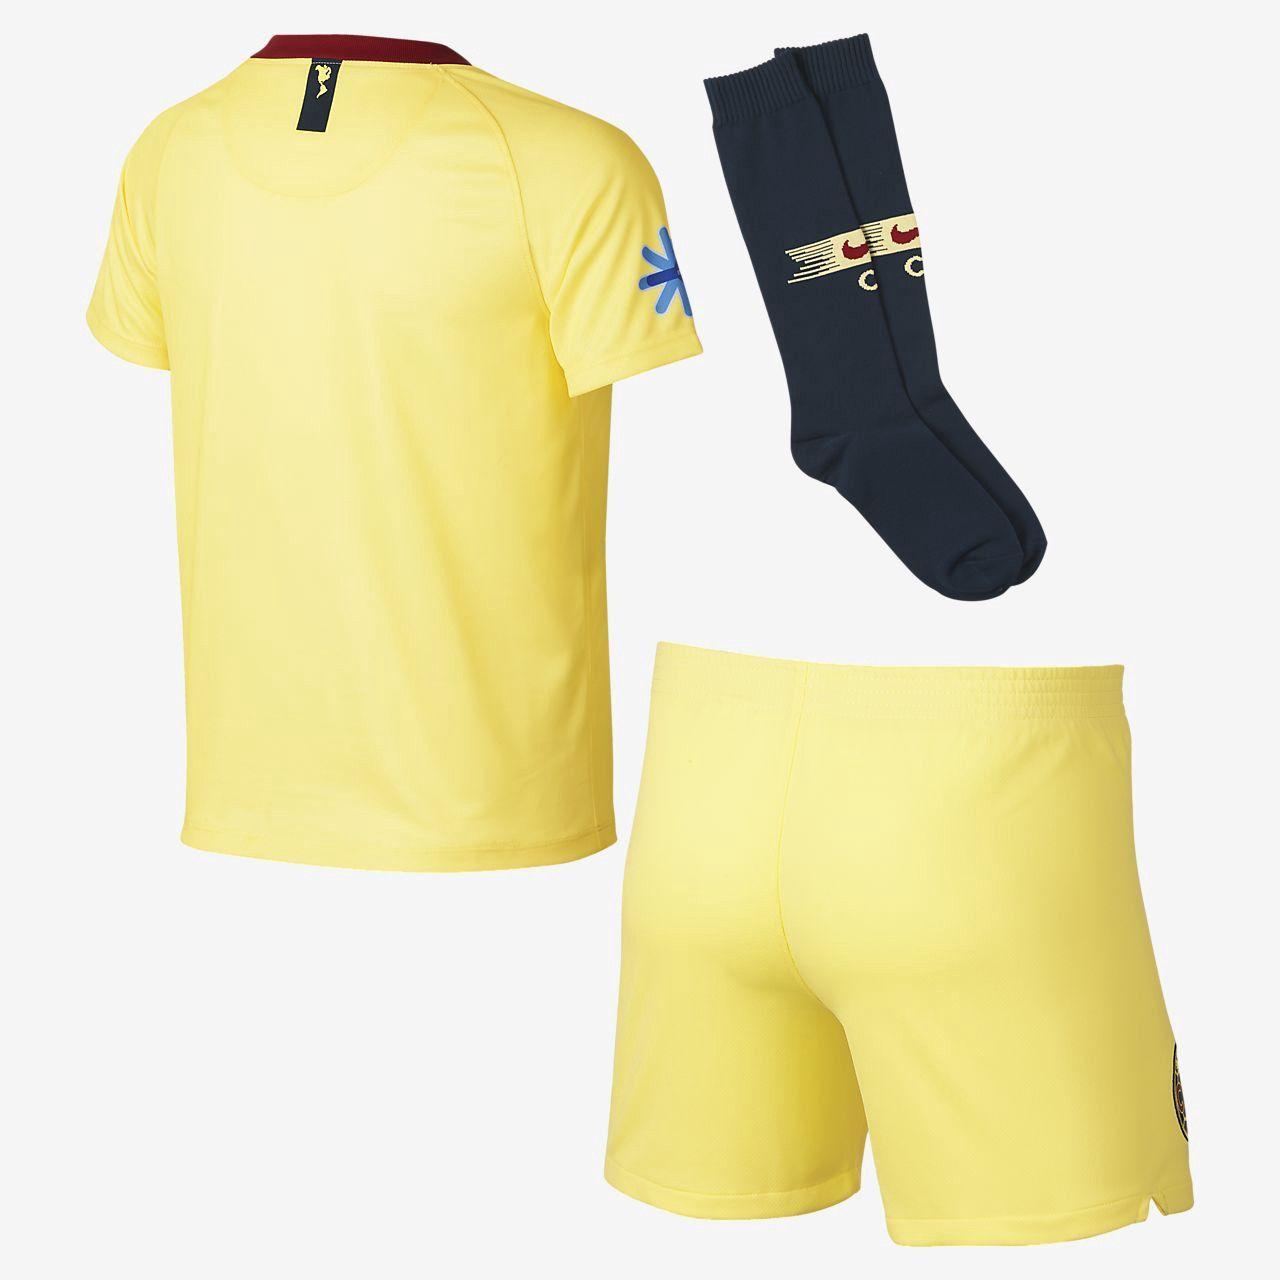 914e18182fa Nike 2018 19 Club America Stadium Home Big Kids  Soccer Kit - M (10-12) Navy